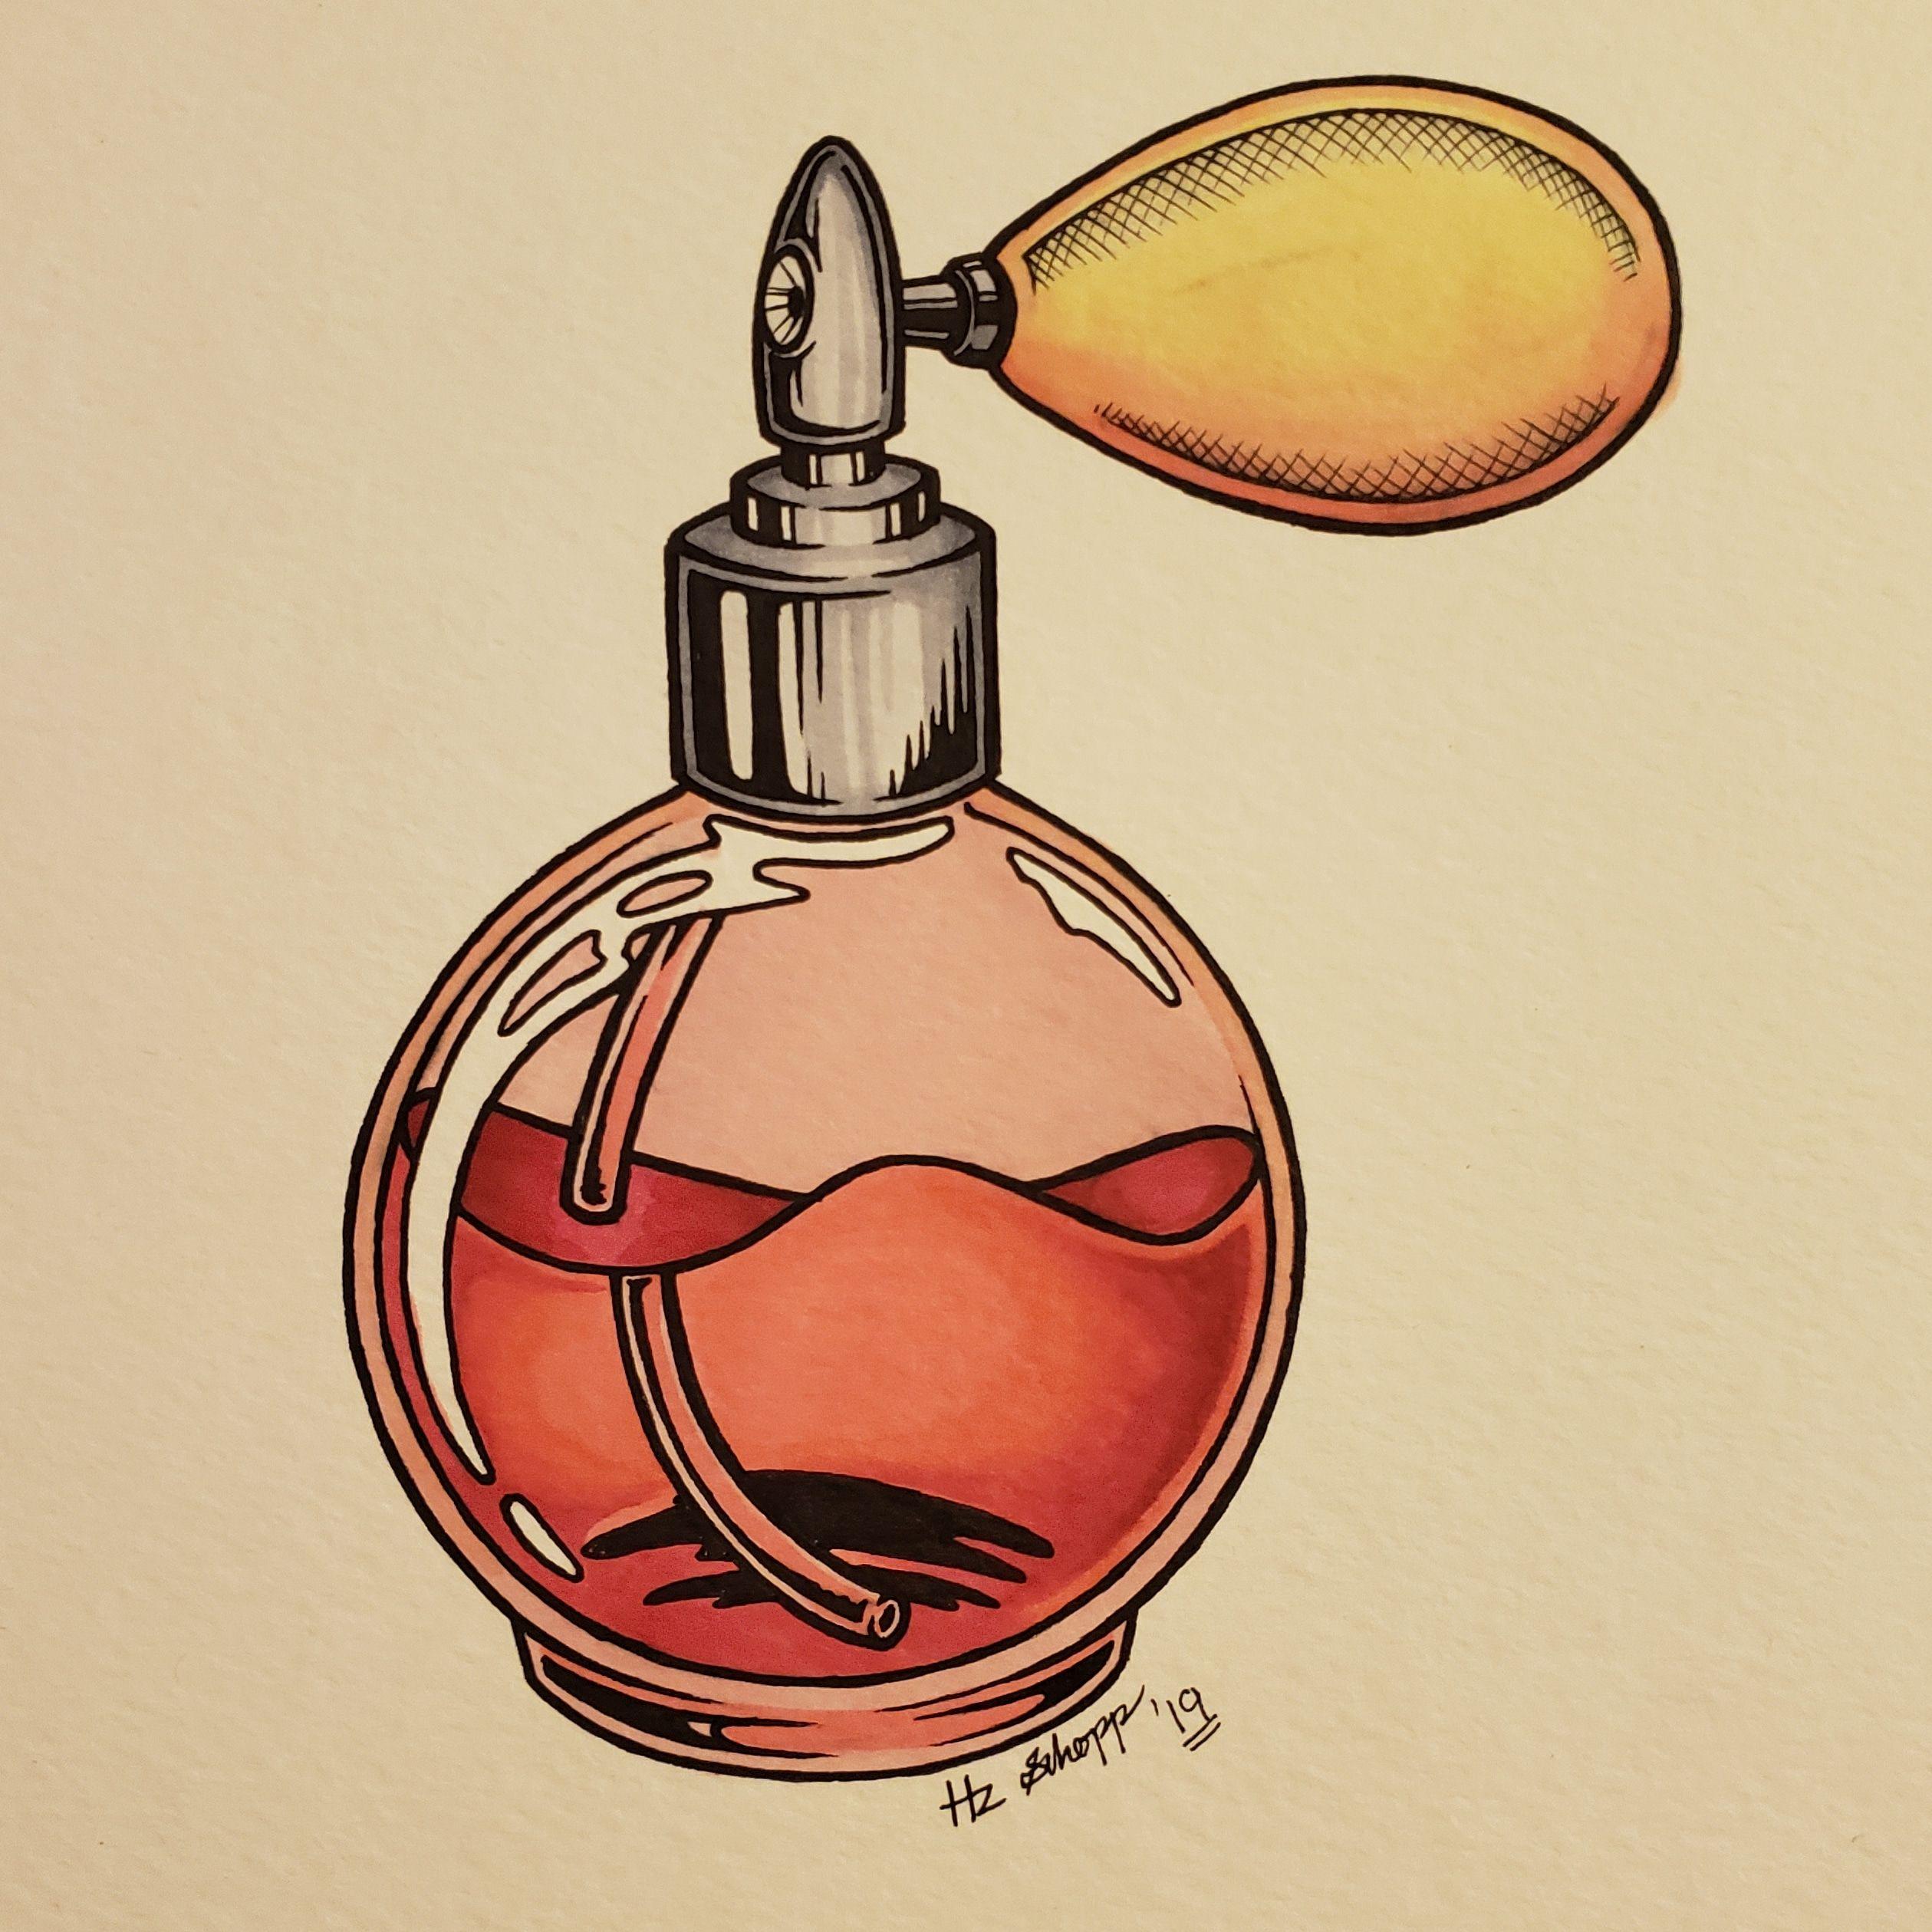 Perfume Bottle Me ink on paper 2019 en 2020 (con imágenes